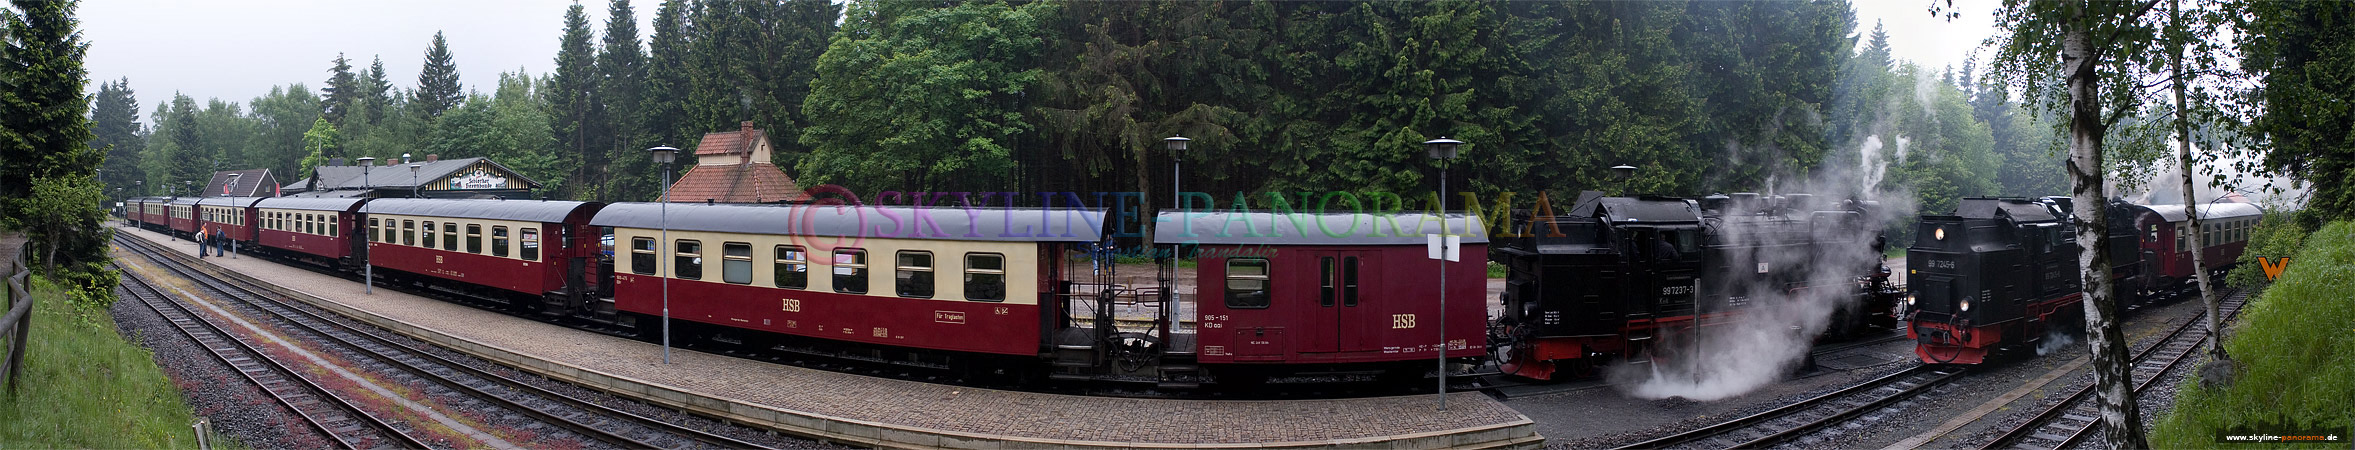 Bild Brockenbahn Bahnhof Schierke